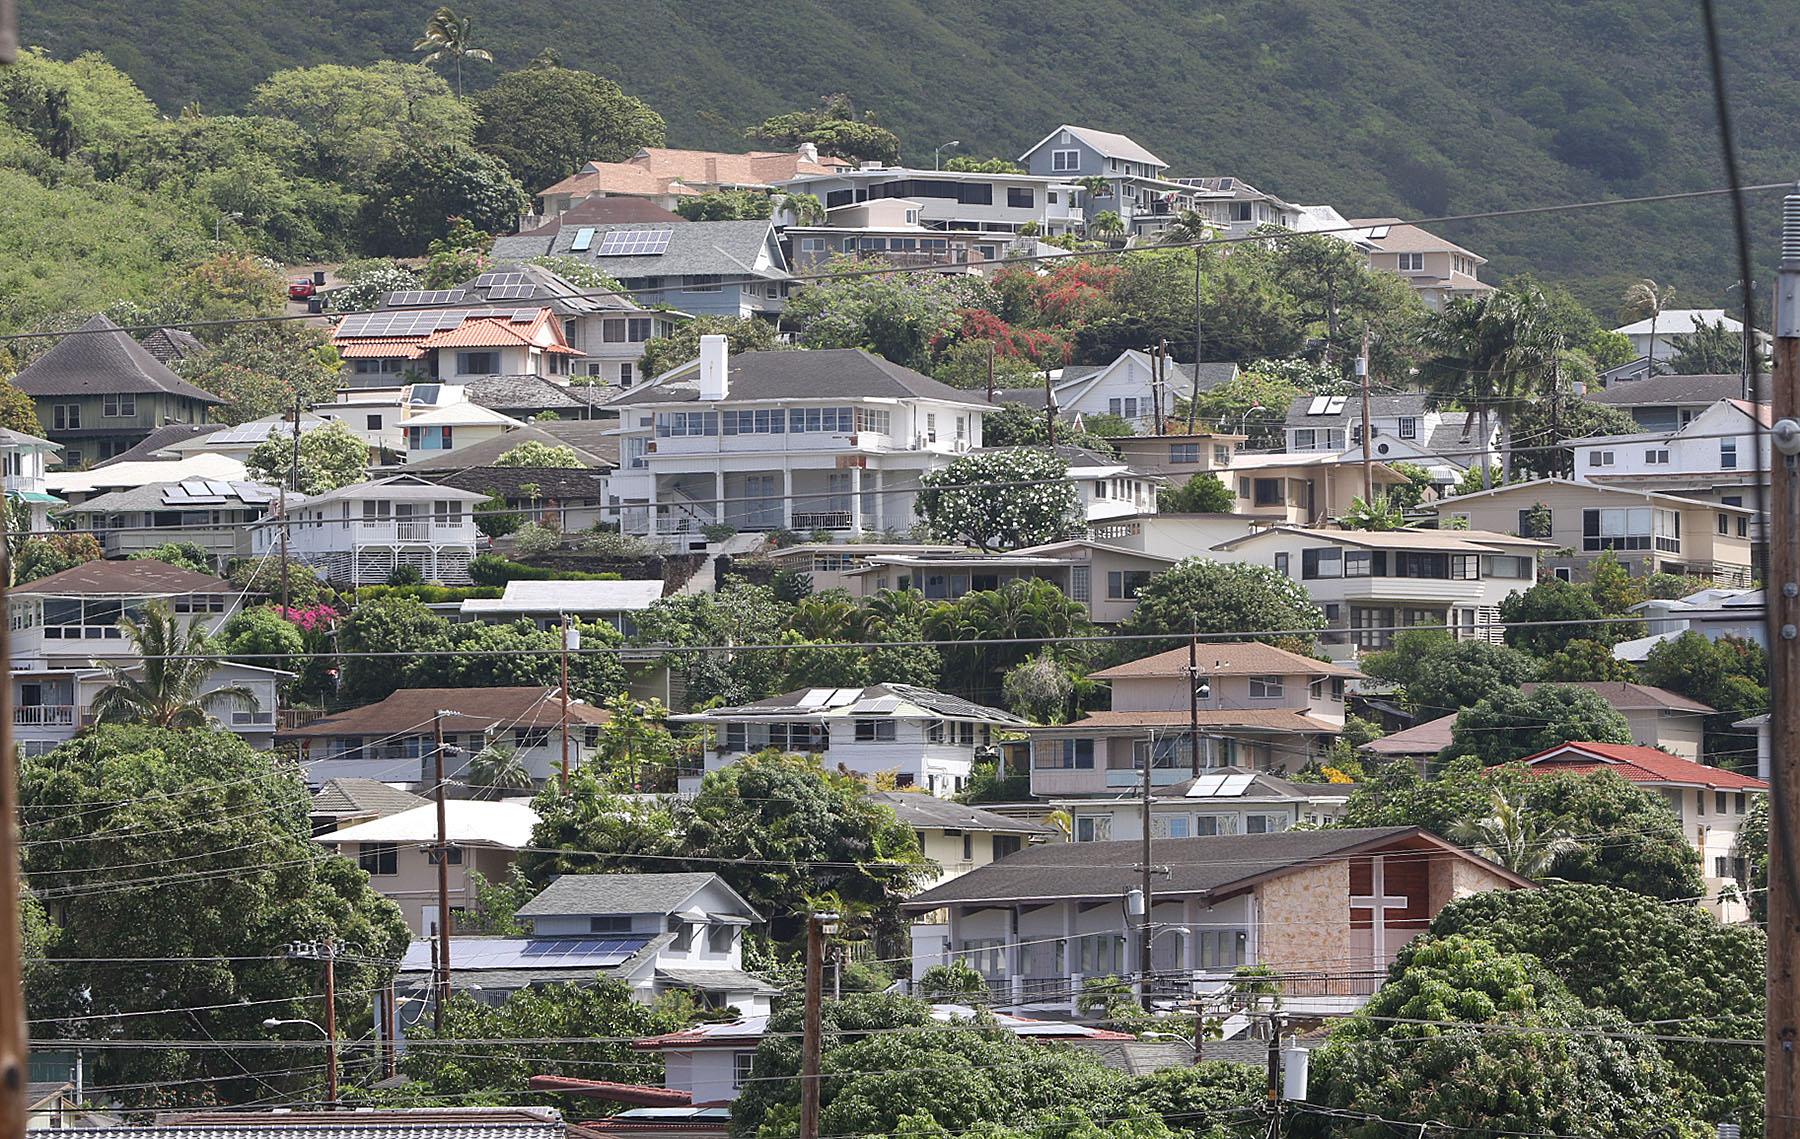 Section 8 Program Gets High Rating - Honolulu Civil Beat